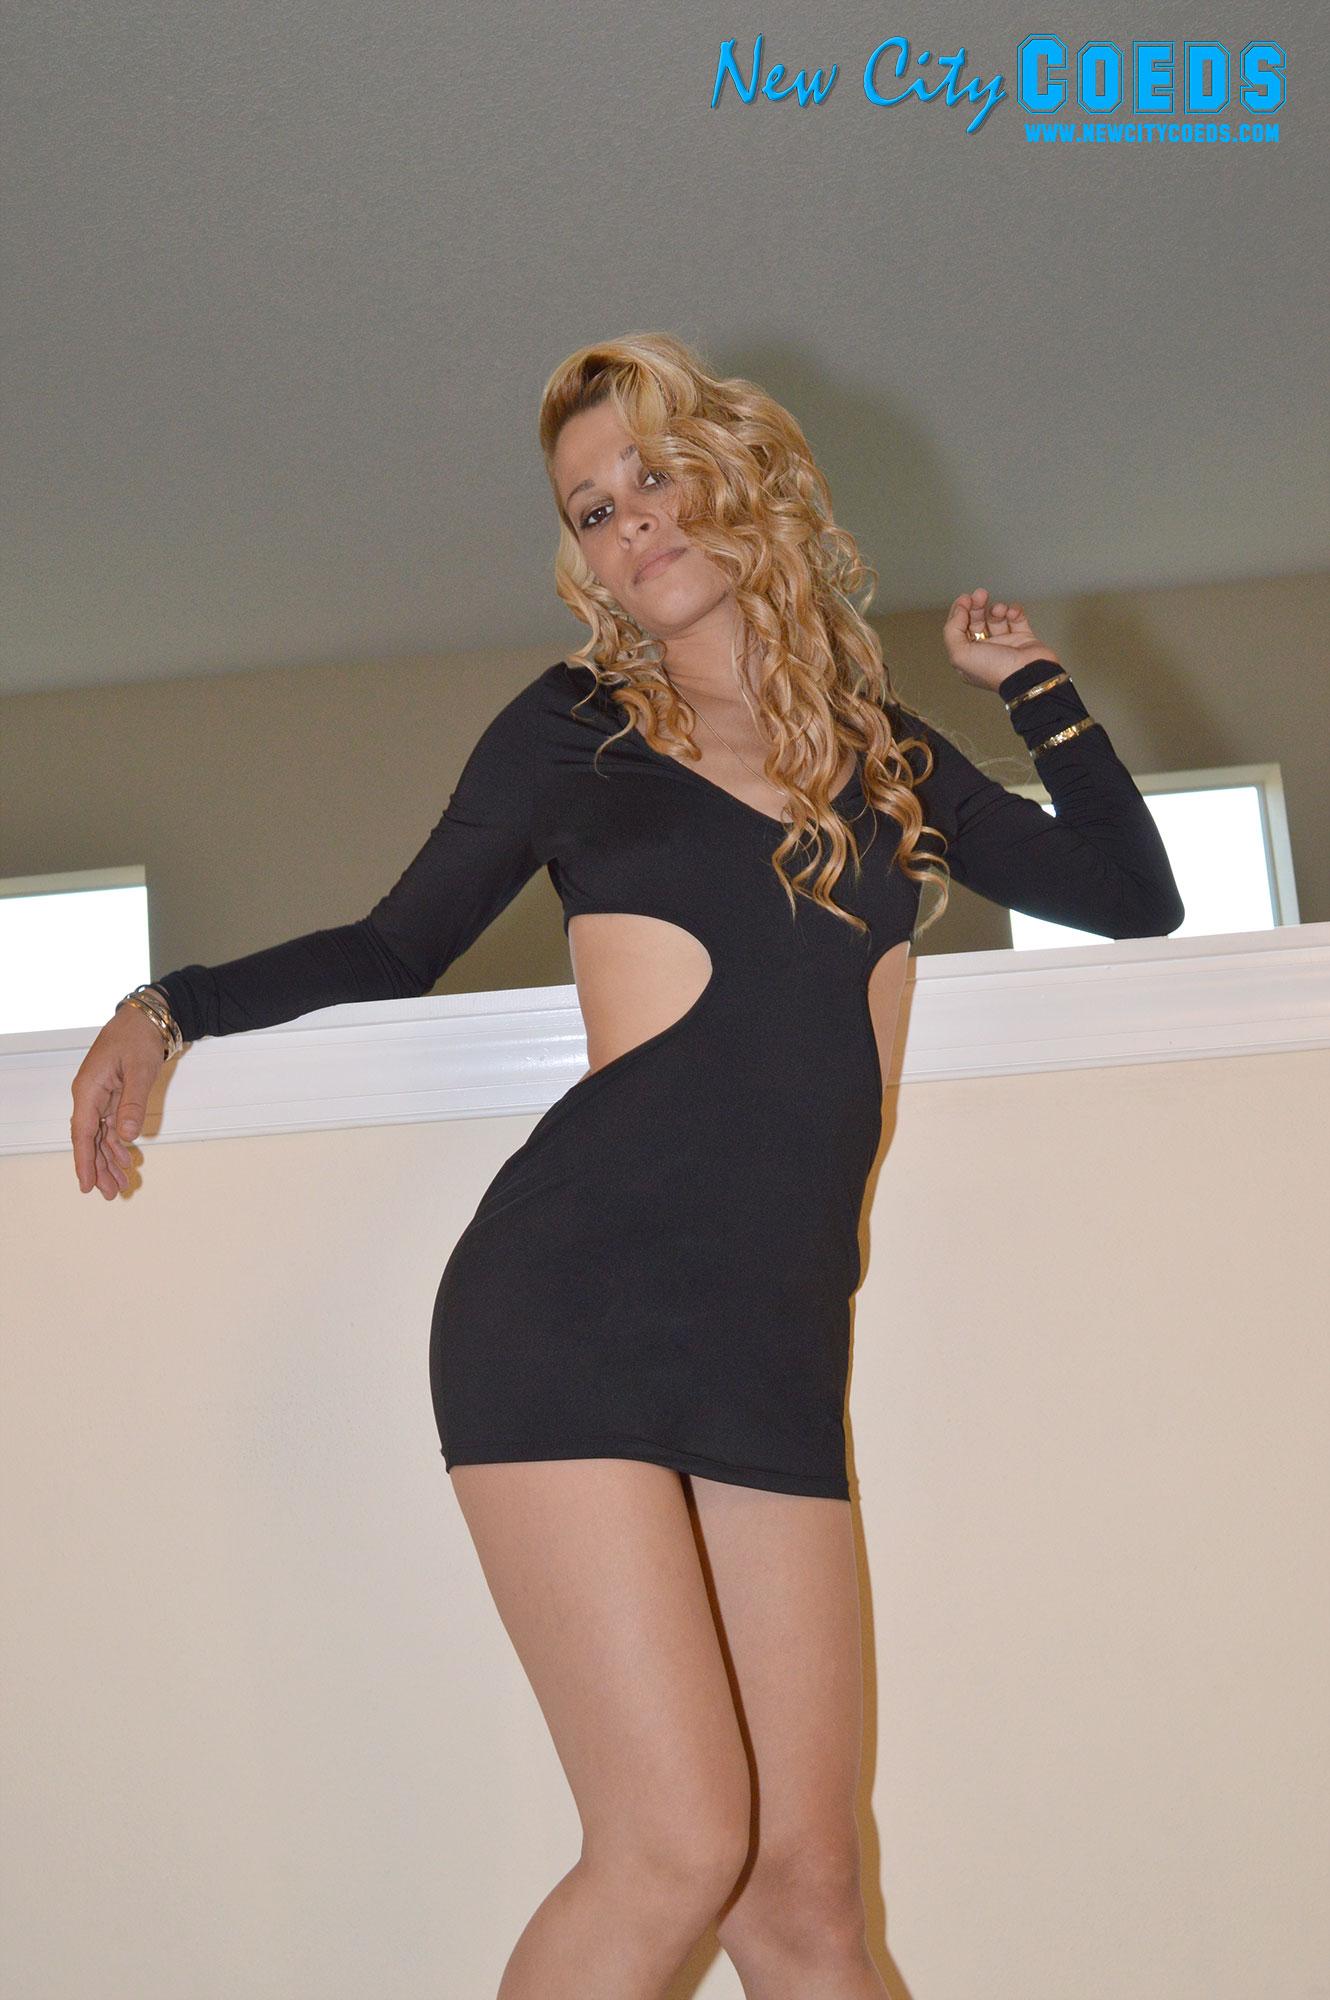 Teen Coed Model Marie - Red Rocker Free Gallery - New City